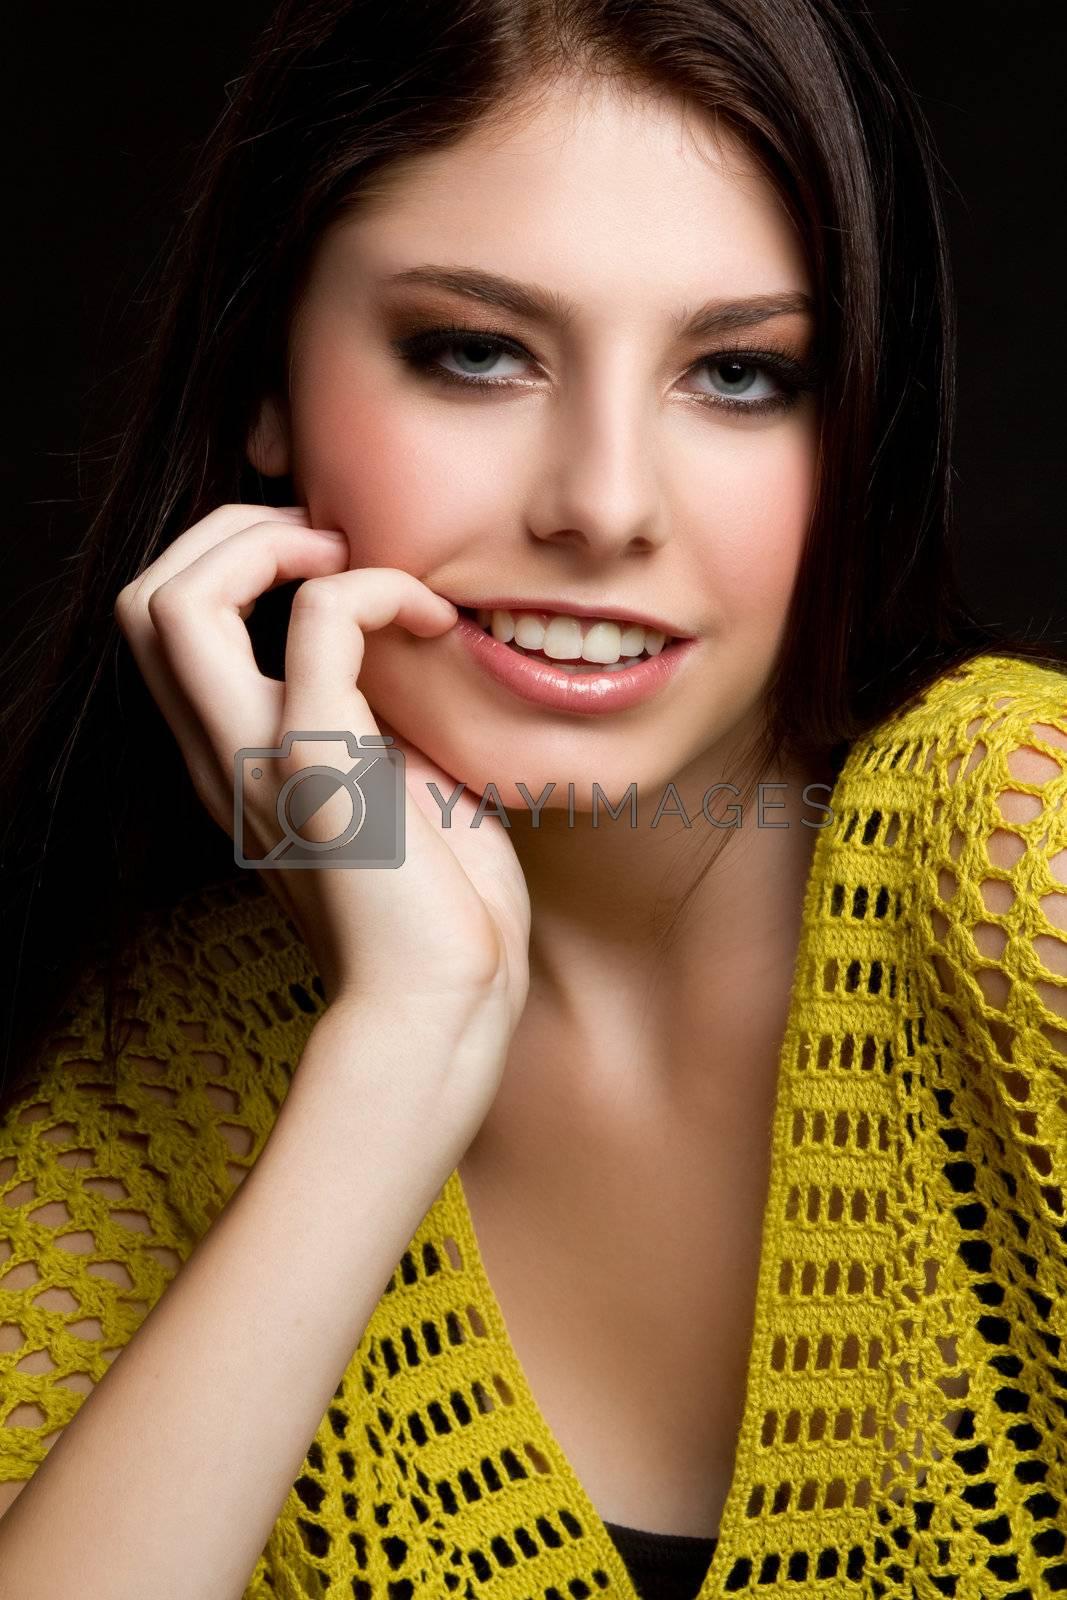 Beautiful young woman smiling portrait